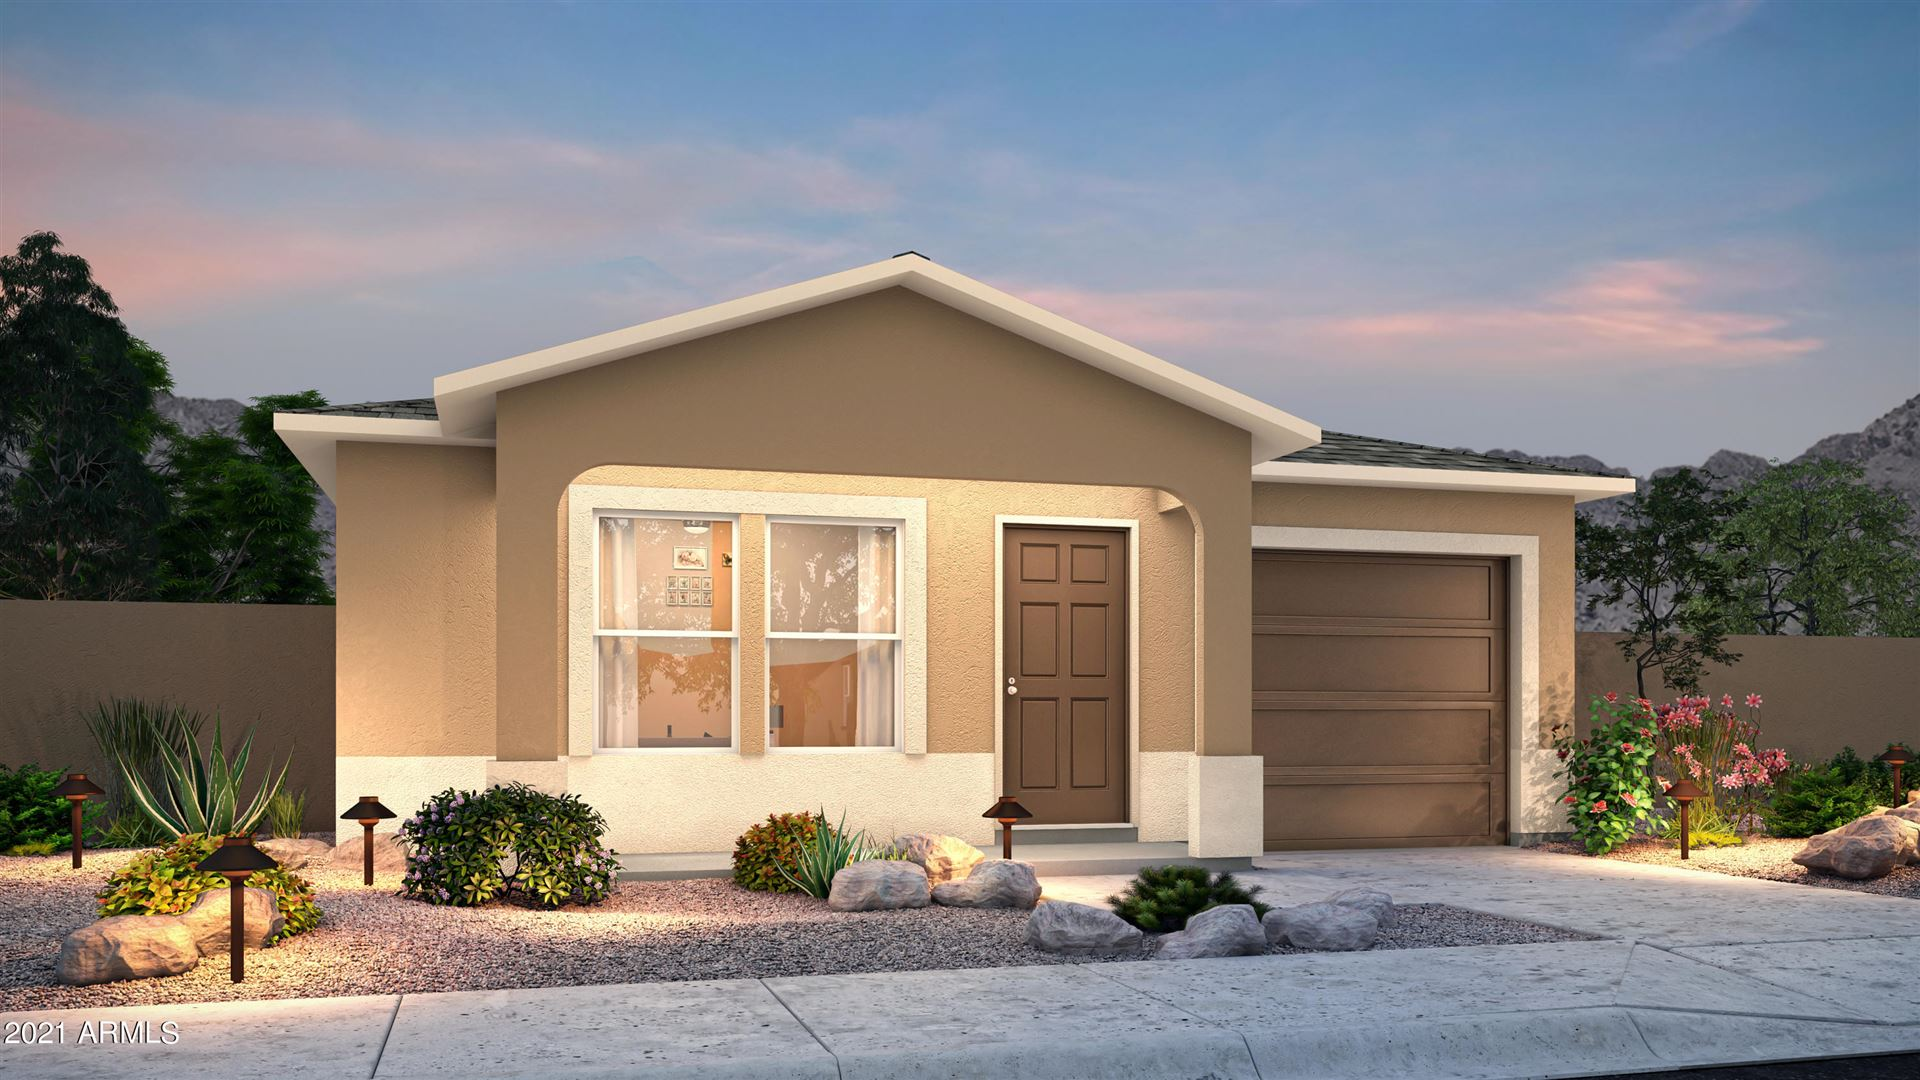 Photo of 463 W Hilquit Drive, Morristown, AZ 85342 (MLS # 6190361)